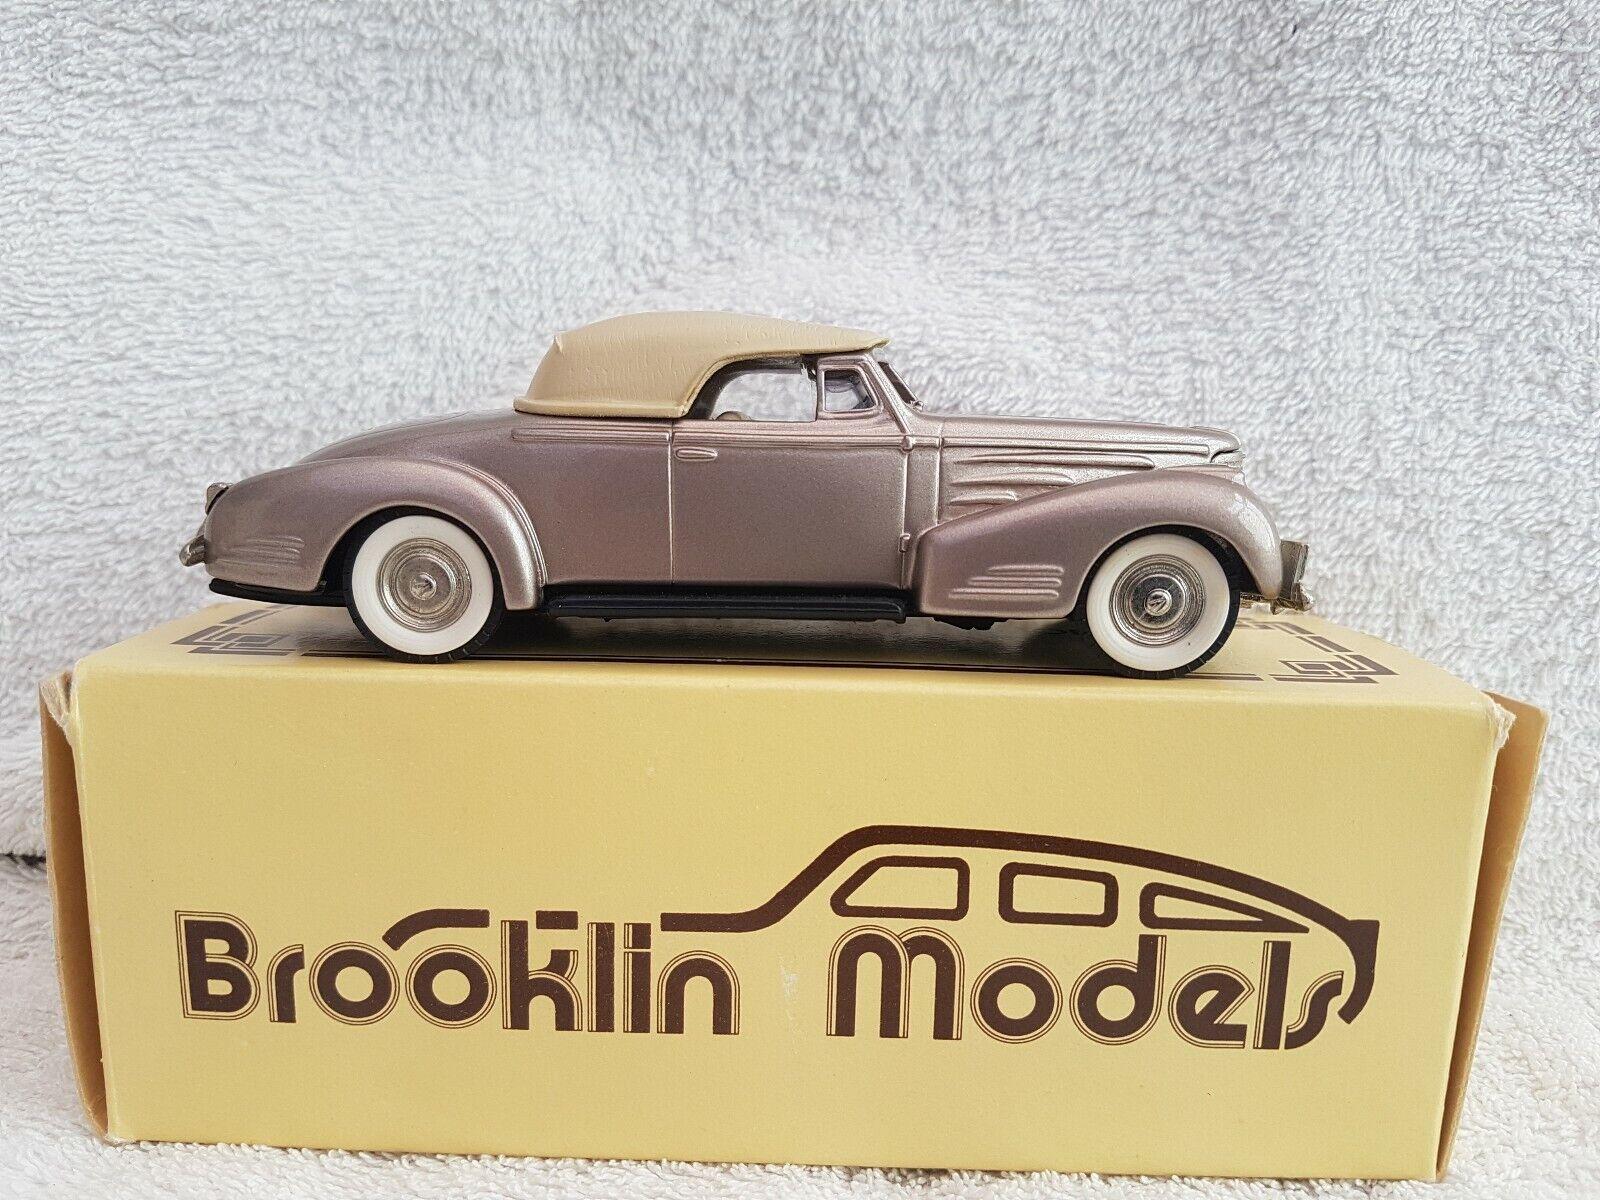 Brooklin Models 1 43 Scale Model Car BRK14 - 1940 Cadillac V16 ConGrünible Coupe